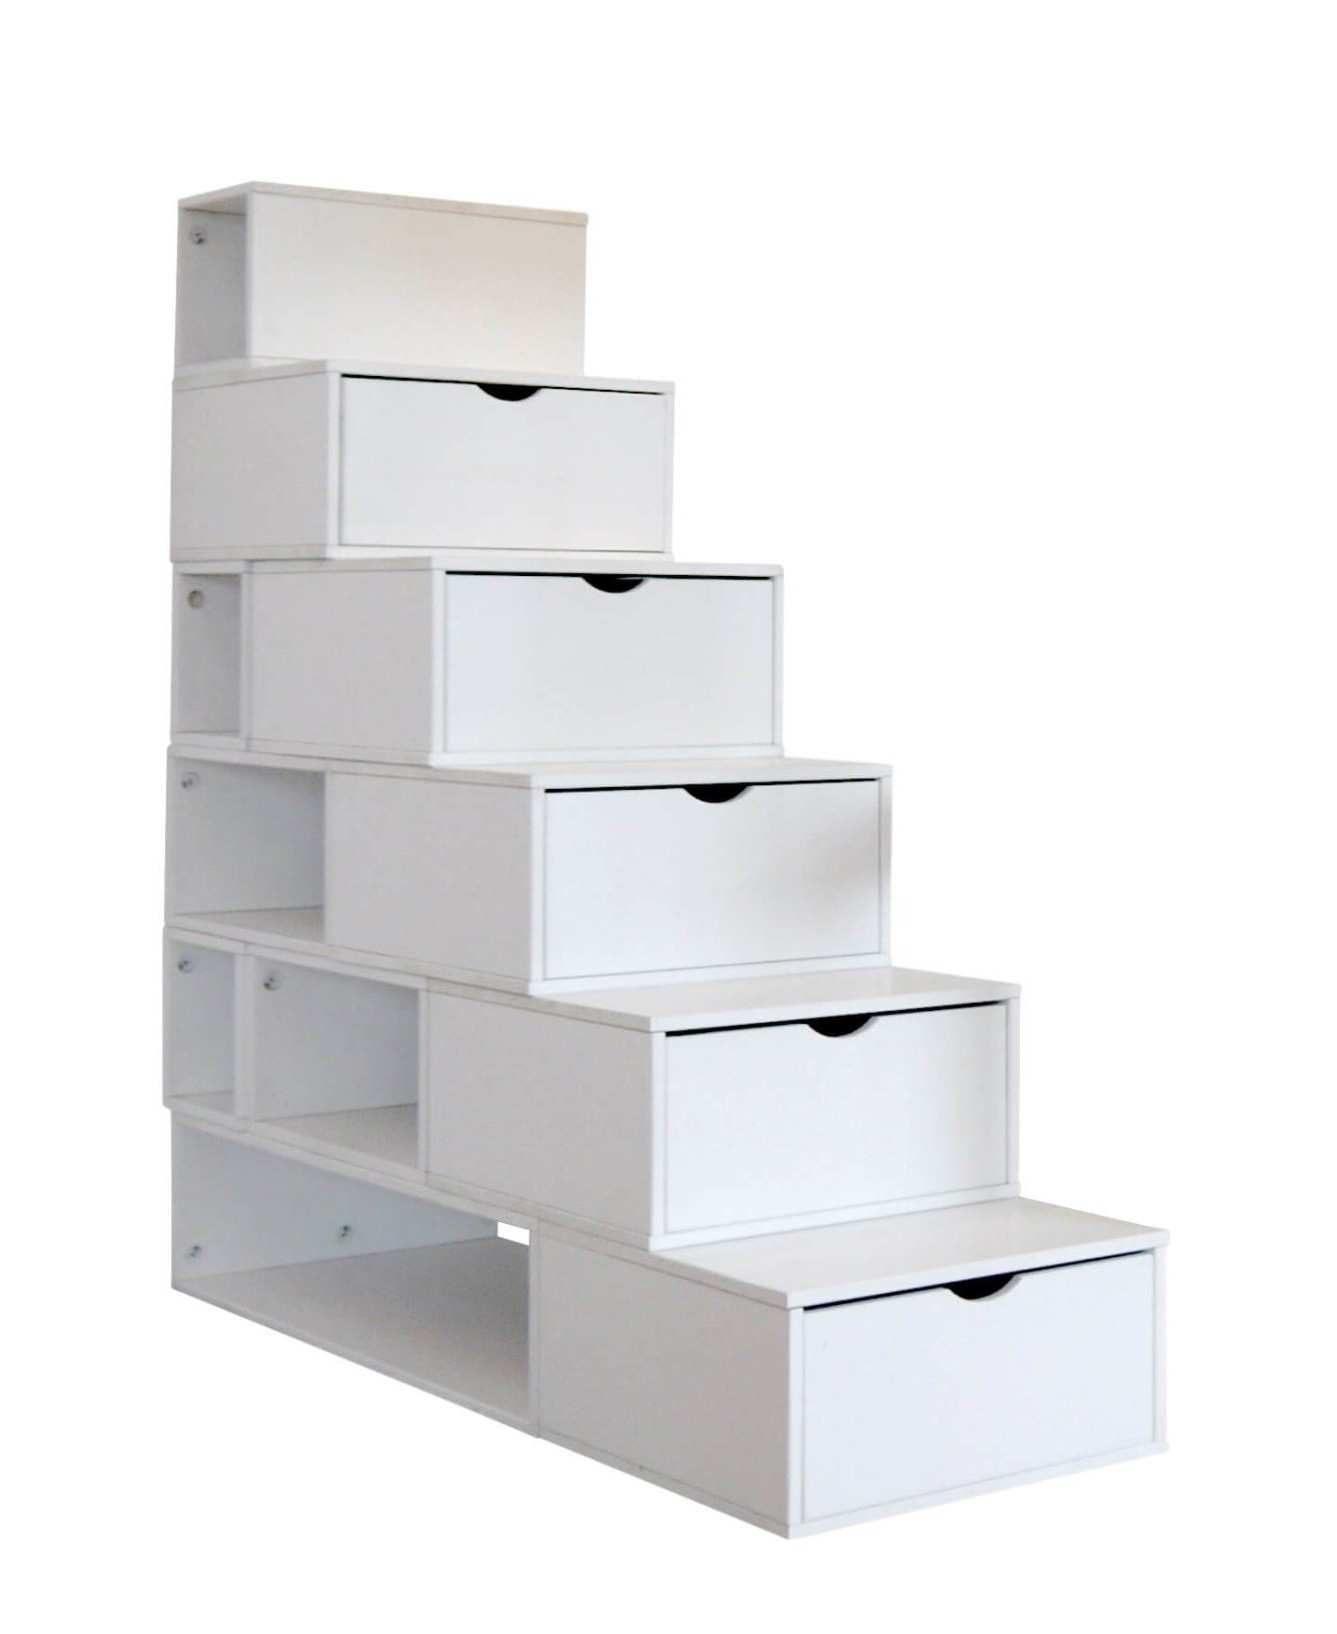 meuble cube pas cher elegant meuble